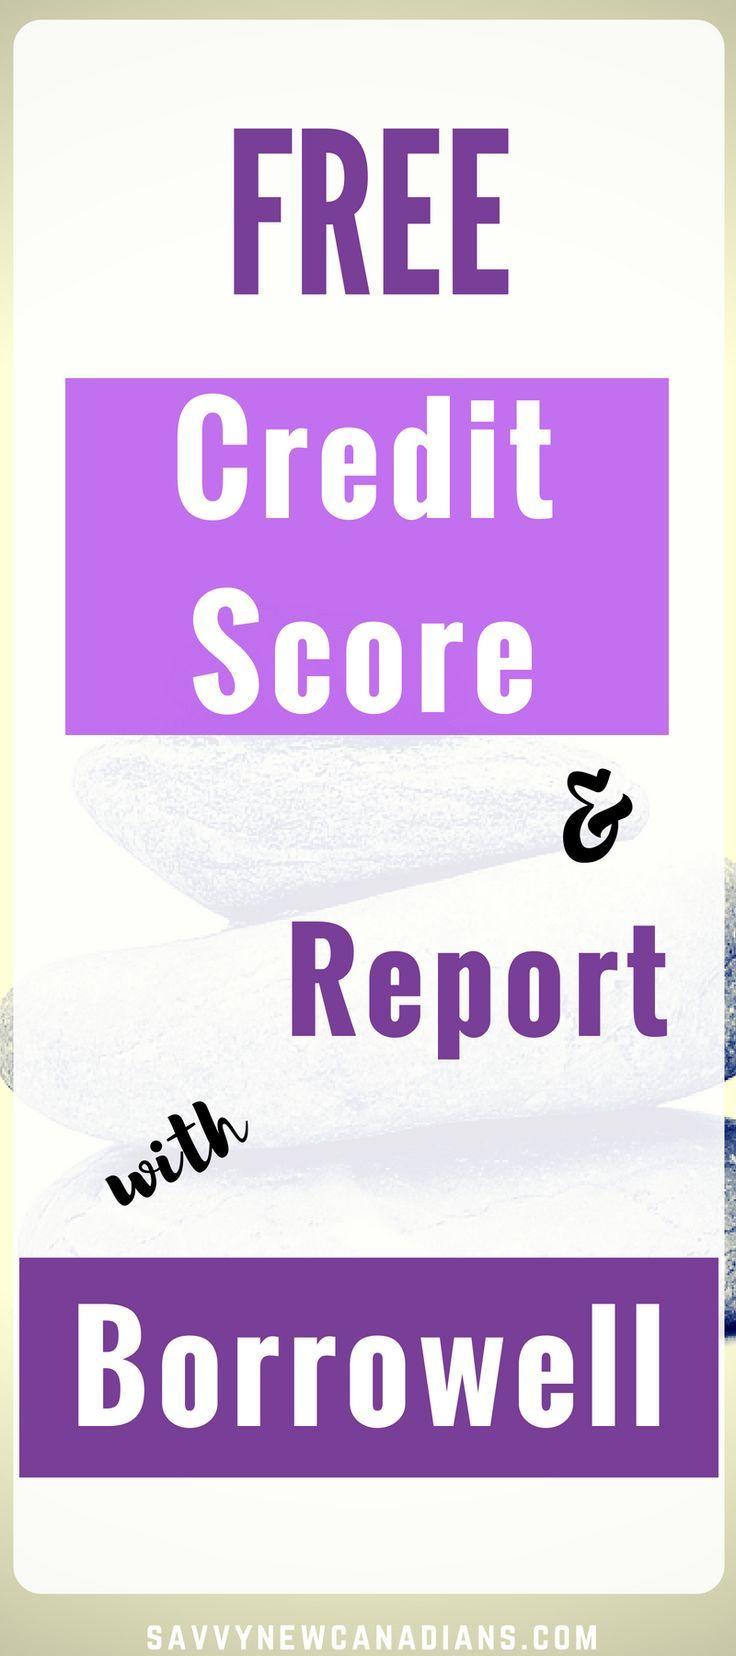 8436a8b6496bf3de44d248466aa2be7c - How To Get A Free Credit Report In Canada Online